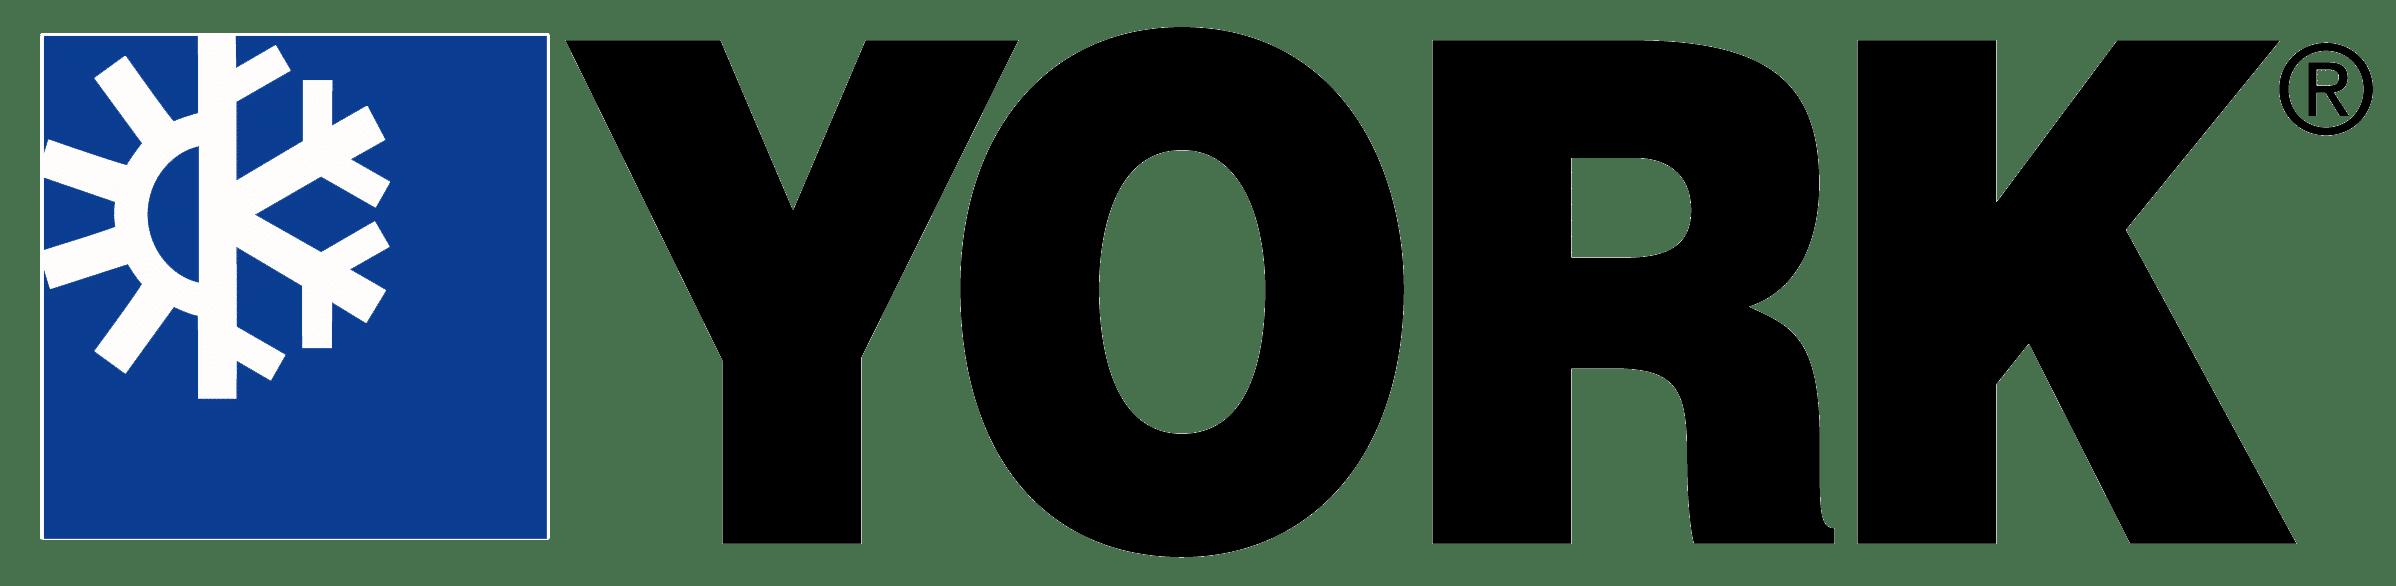 CMI Mechanical Installs York HVAC units